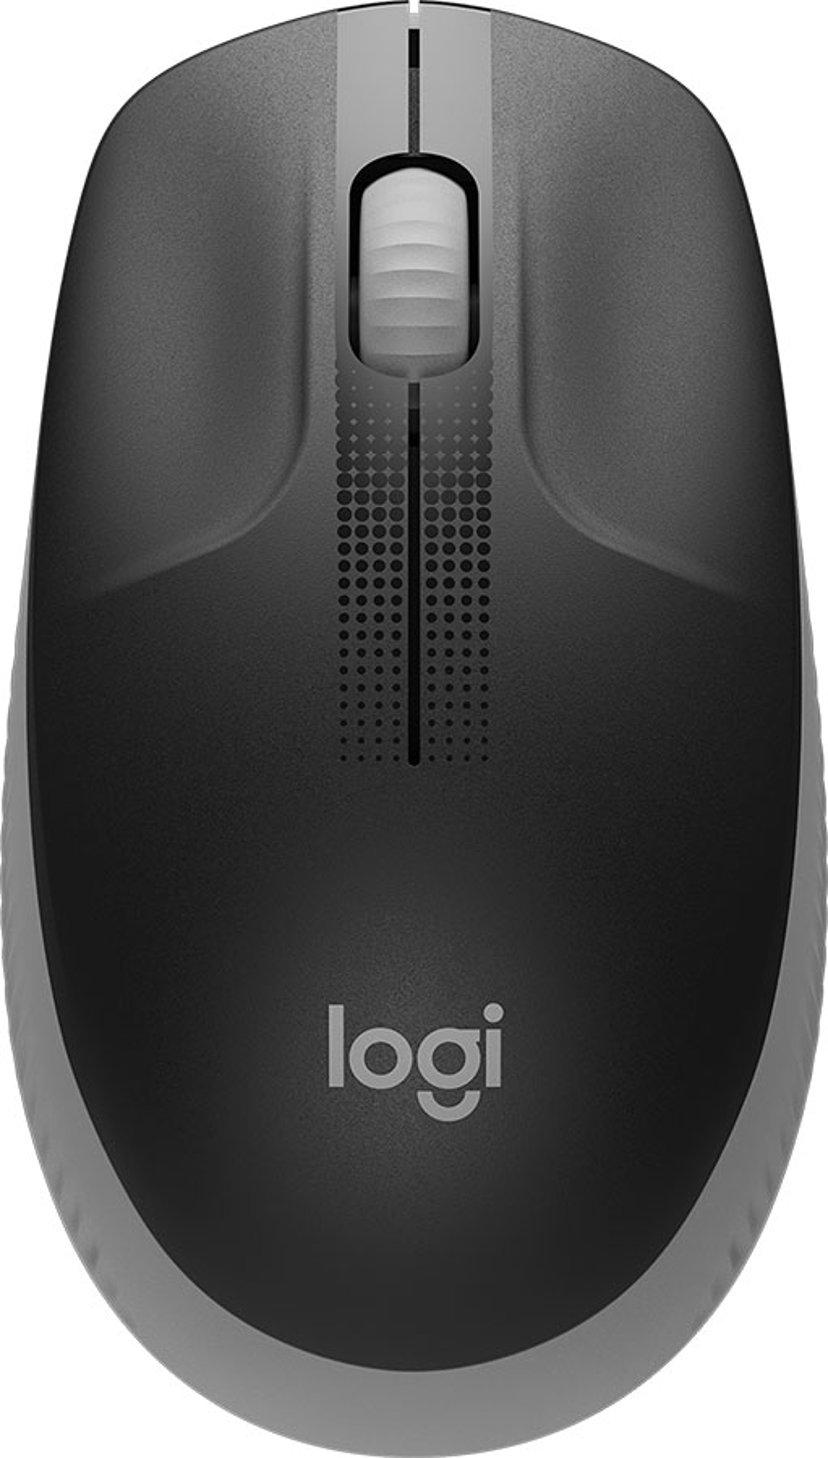 Logitech M190 Full-Size Wireless Mouse - Mid Grey 1,000dpi Mus Trådløs Grå